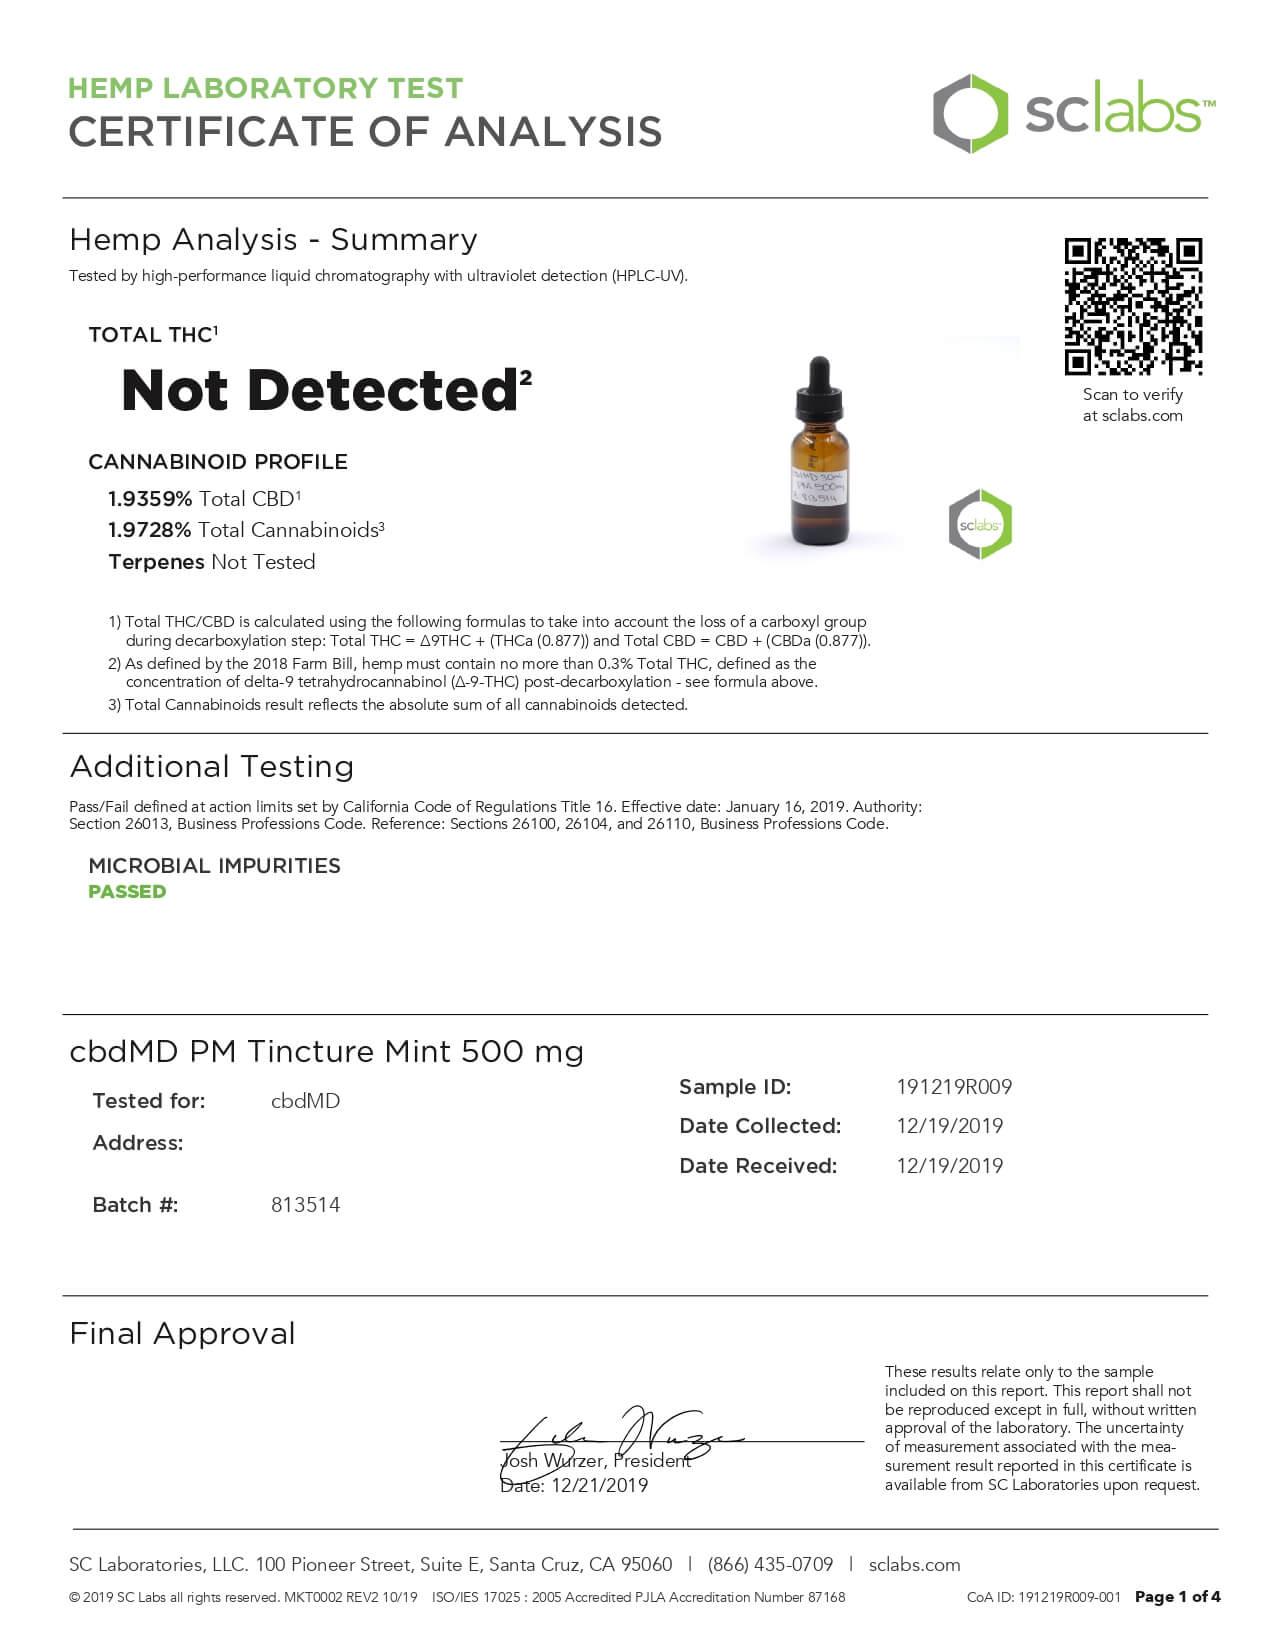 cbdMD CBD Tincture Broad Spectrum Nighttime PM Mint Lab Report